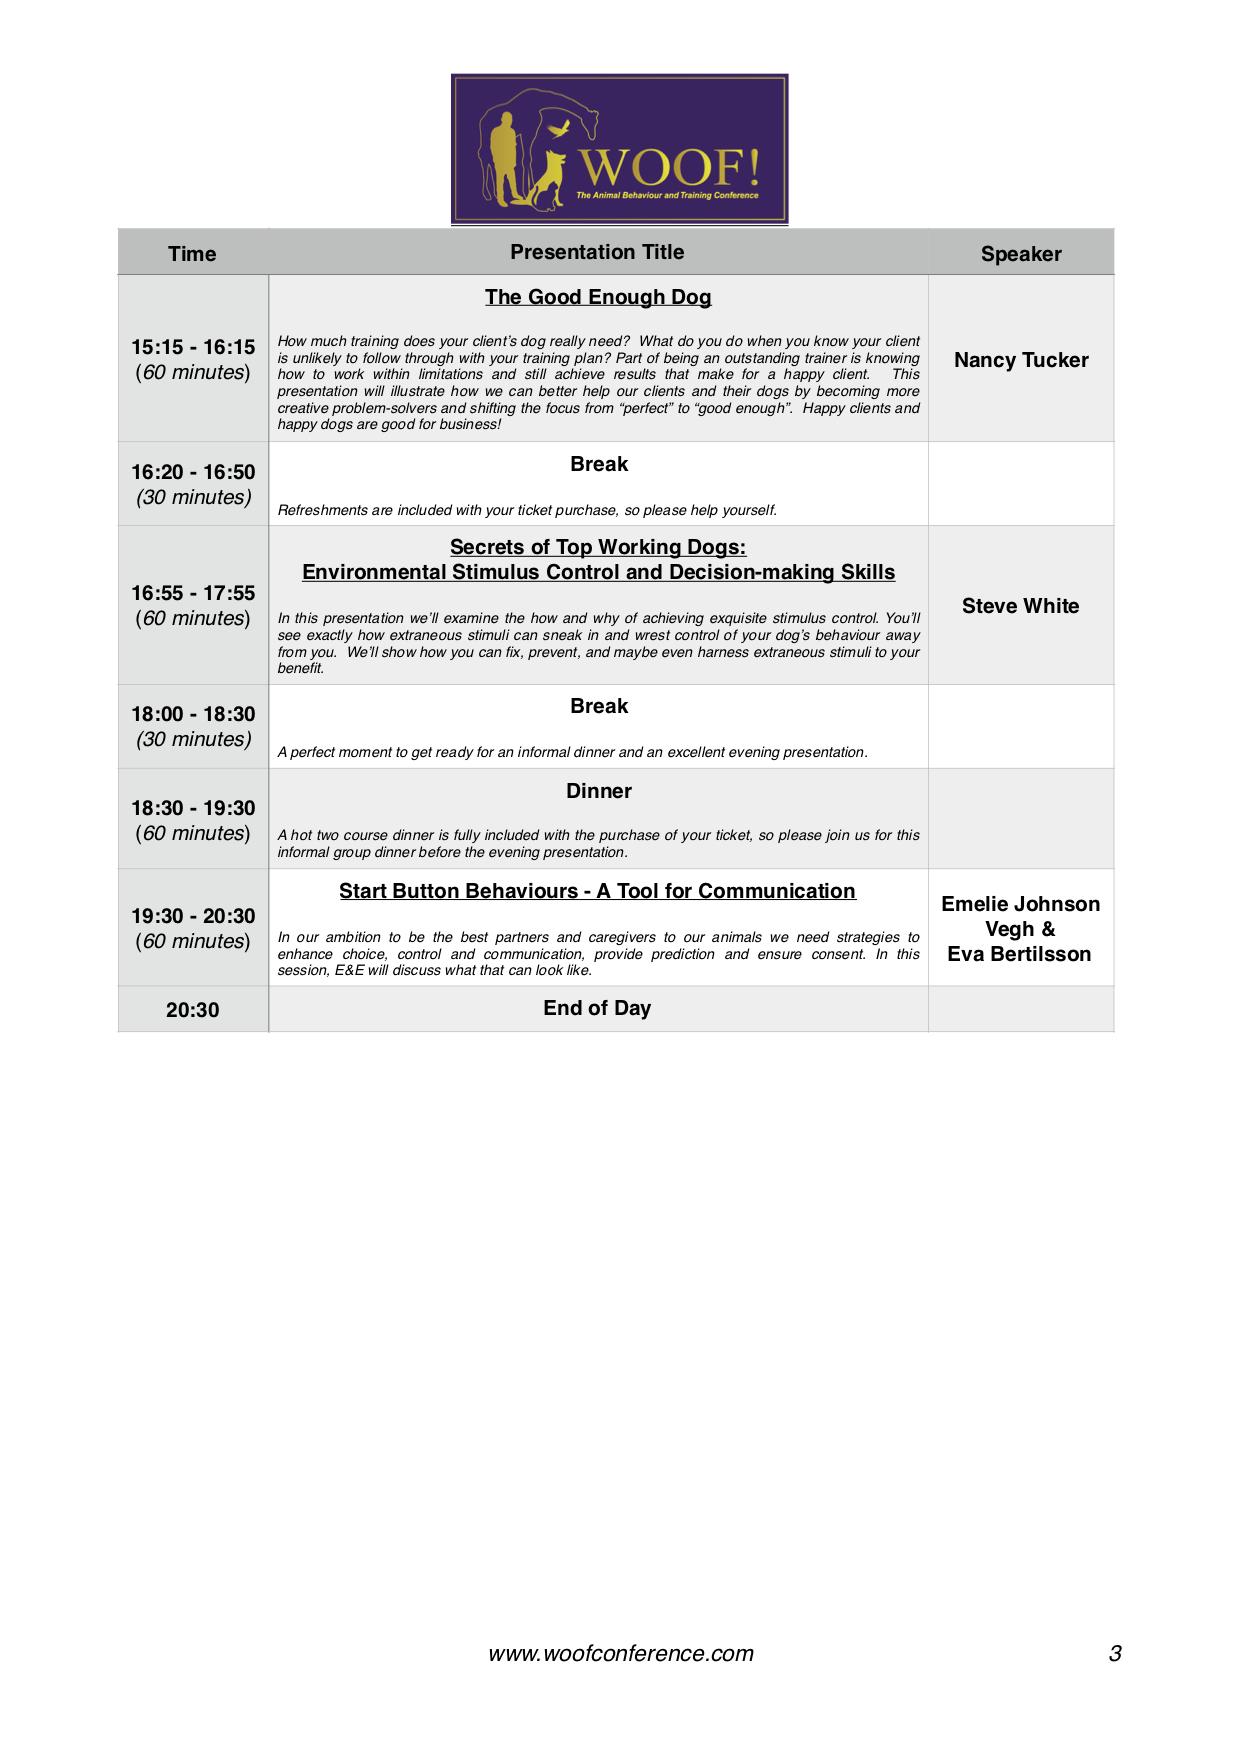 WOOF! 2019 Schedule Public 1.0 Page 3.jpg